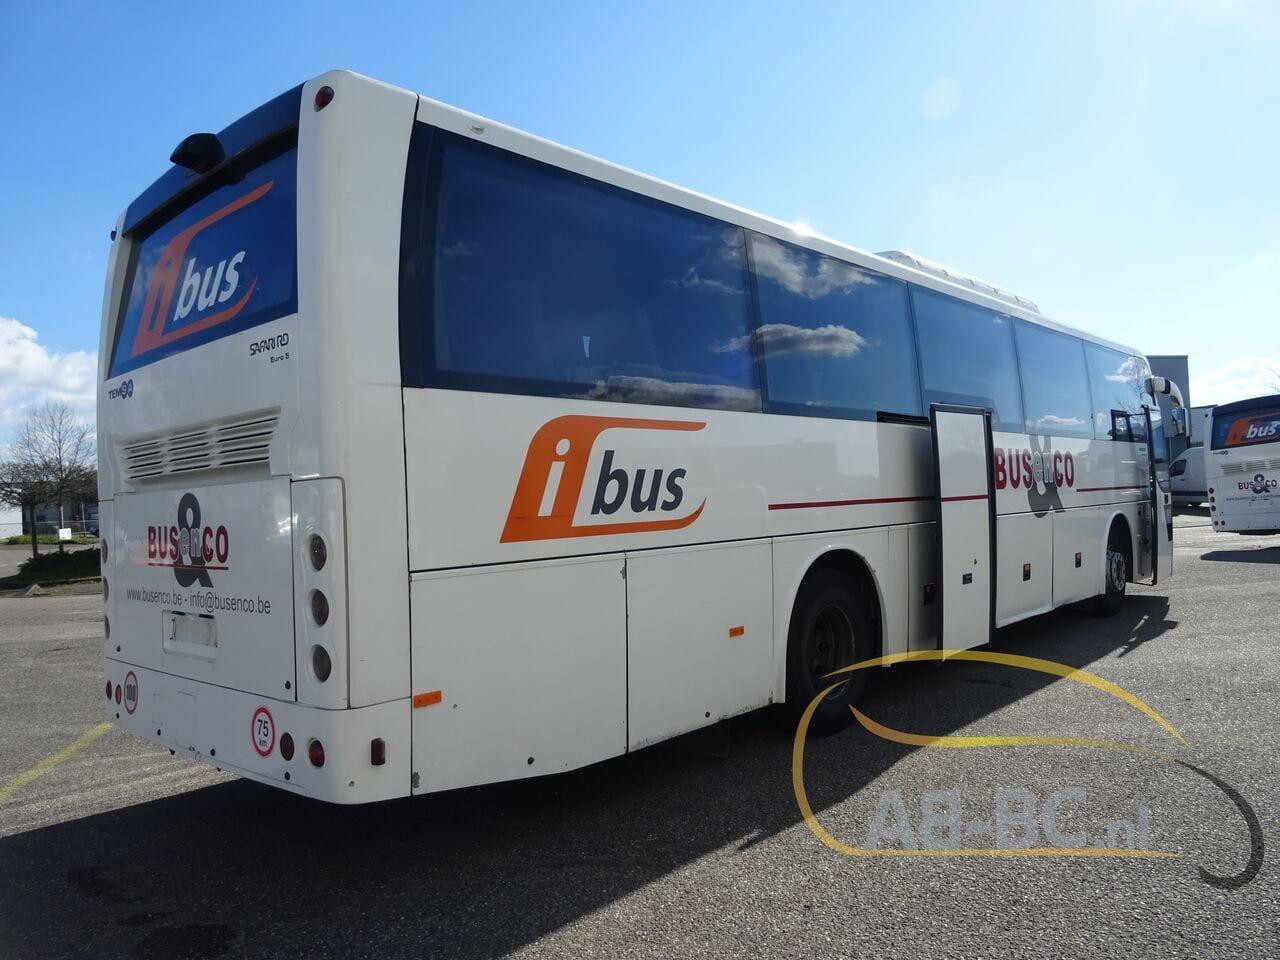 coach-busTEMSA-Safari-RD-53-Seats-DAF-Motor-12-mtr---1616166585538591905_big_06239cfdcfcf1568d4f8f964333fdd6c--21031917053743807500